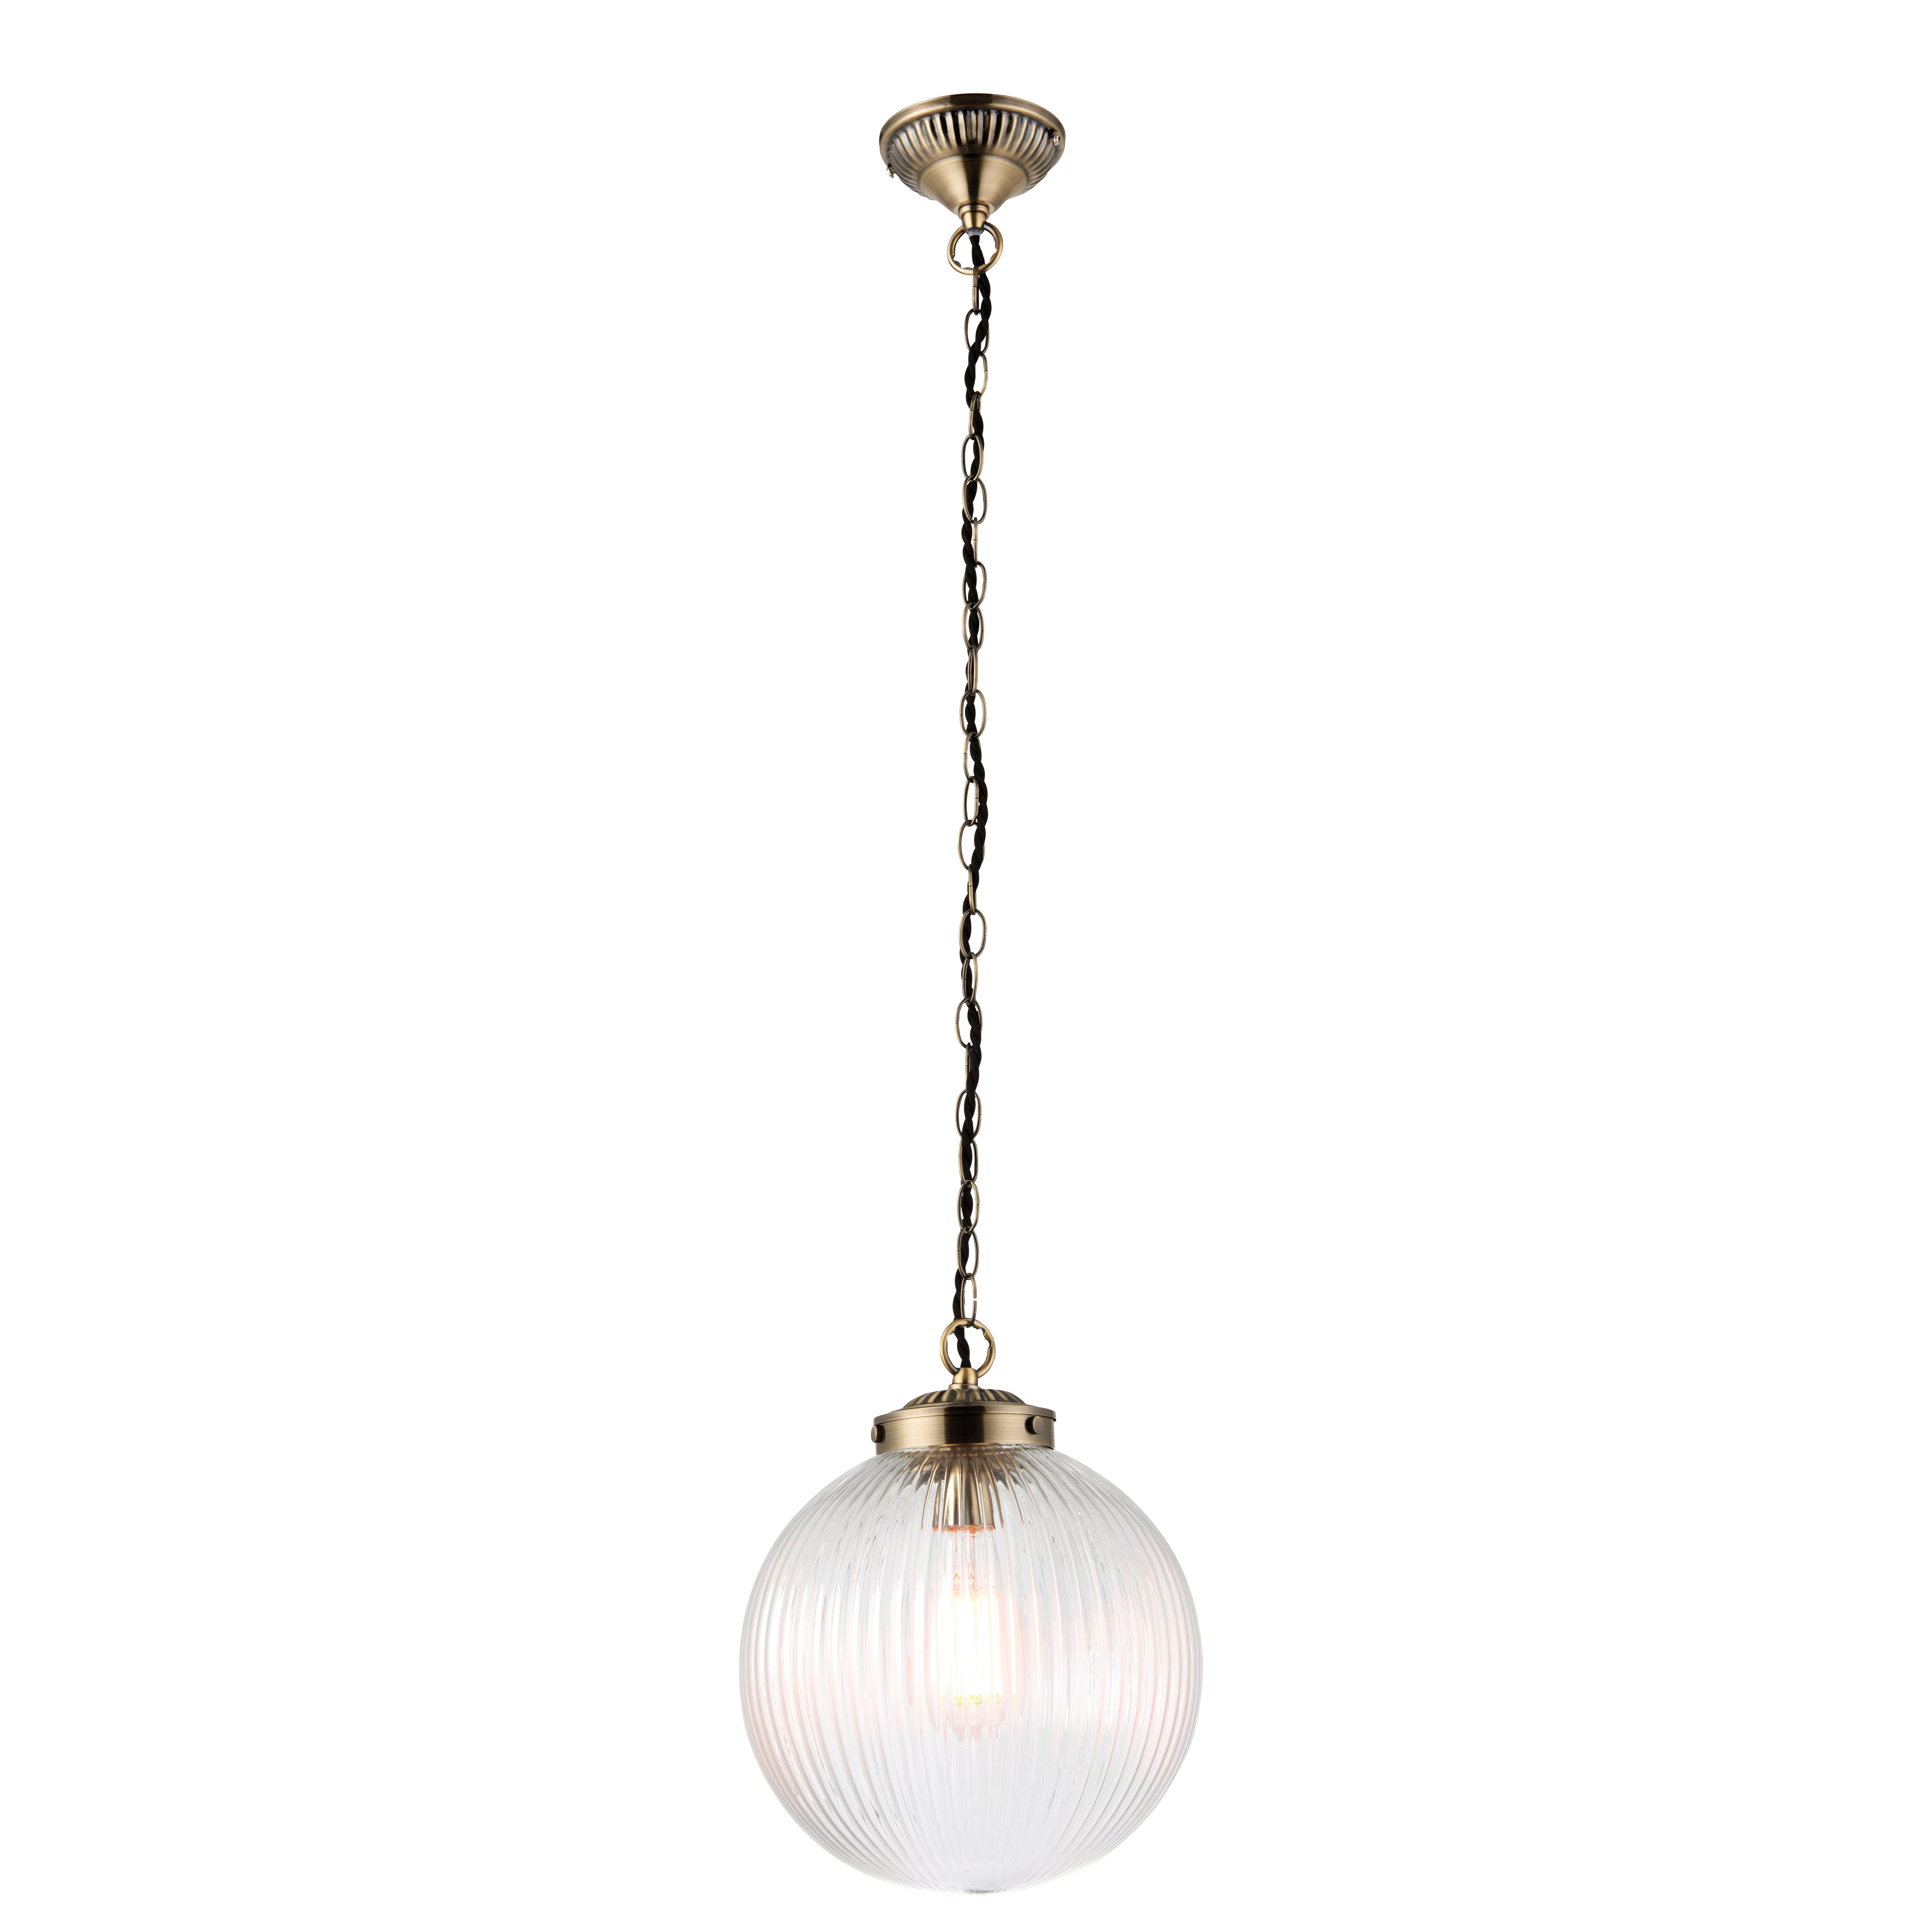 Popular Photo of 1 Light Globe Pendants